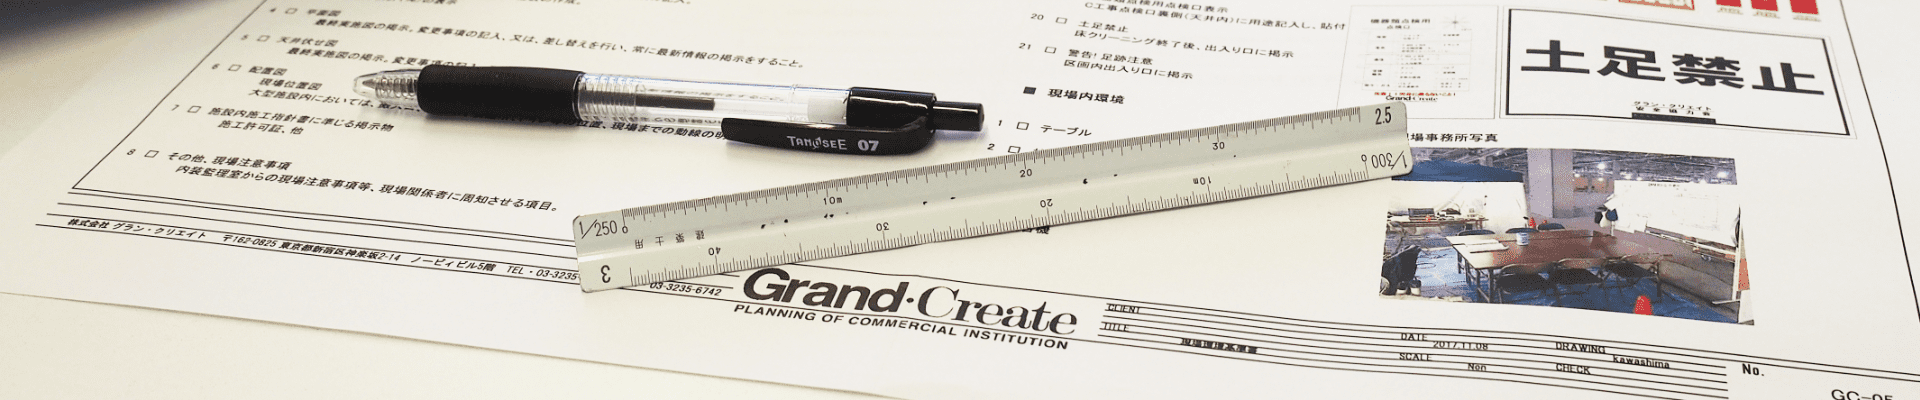 Grand・Create